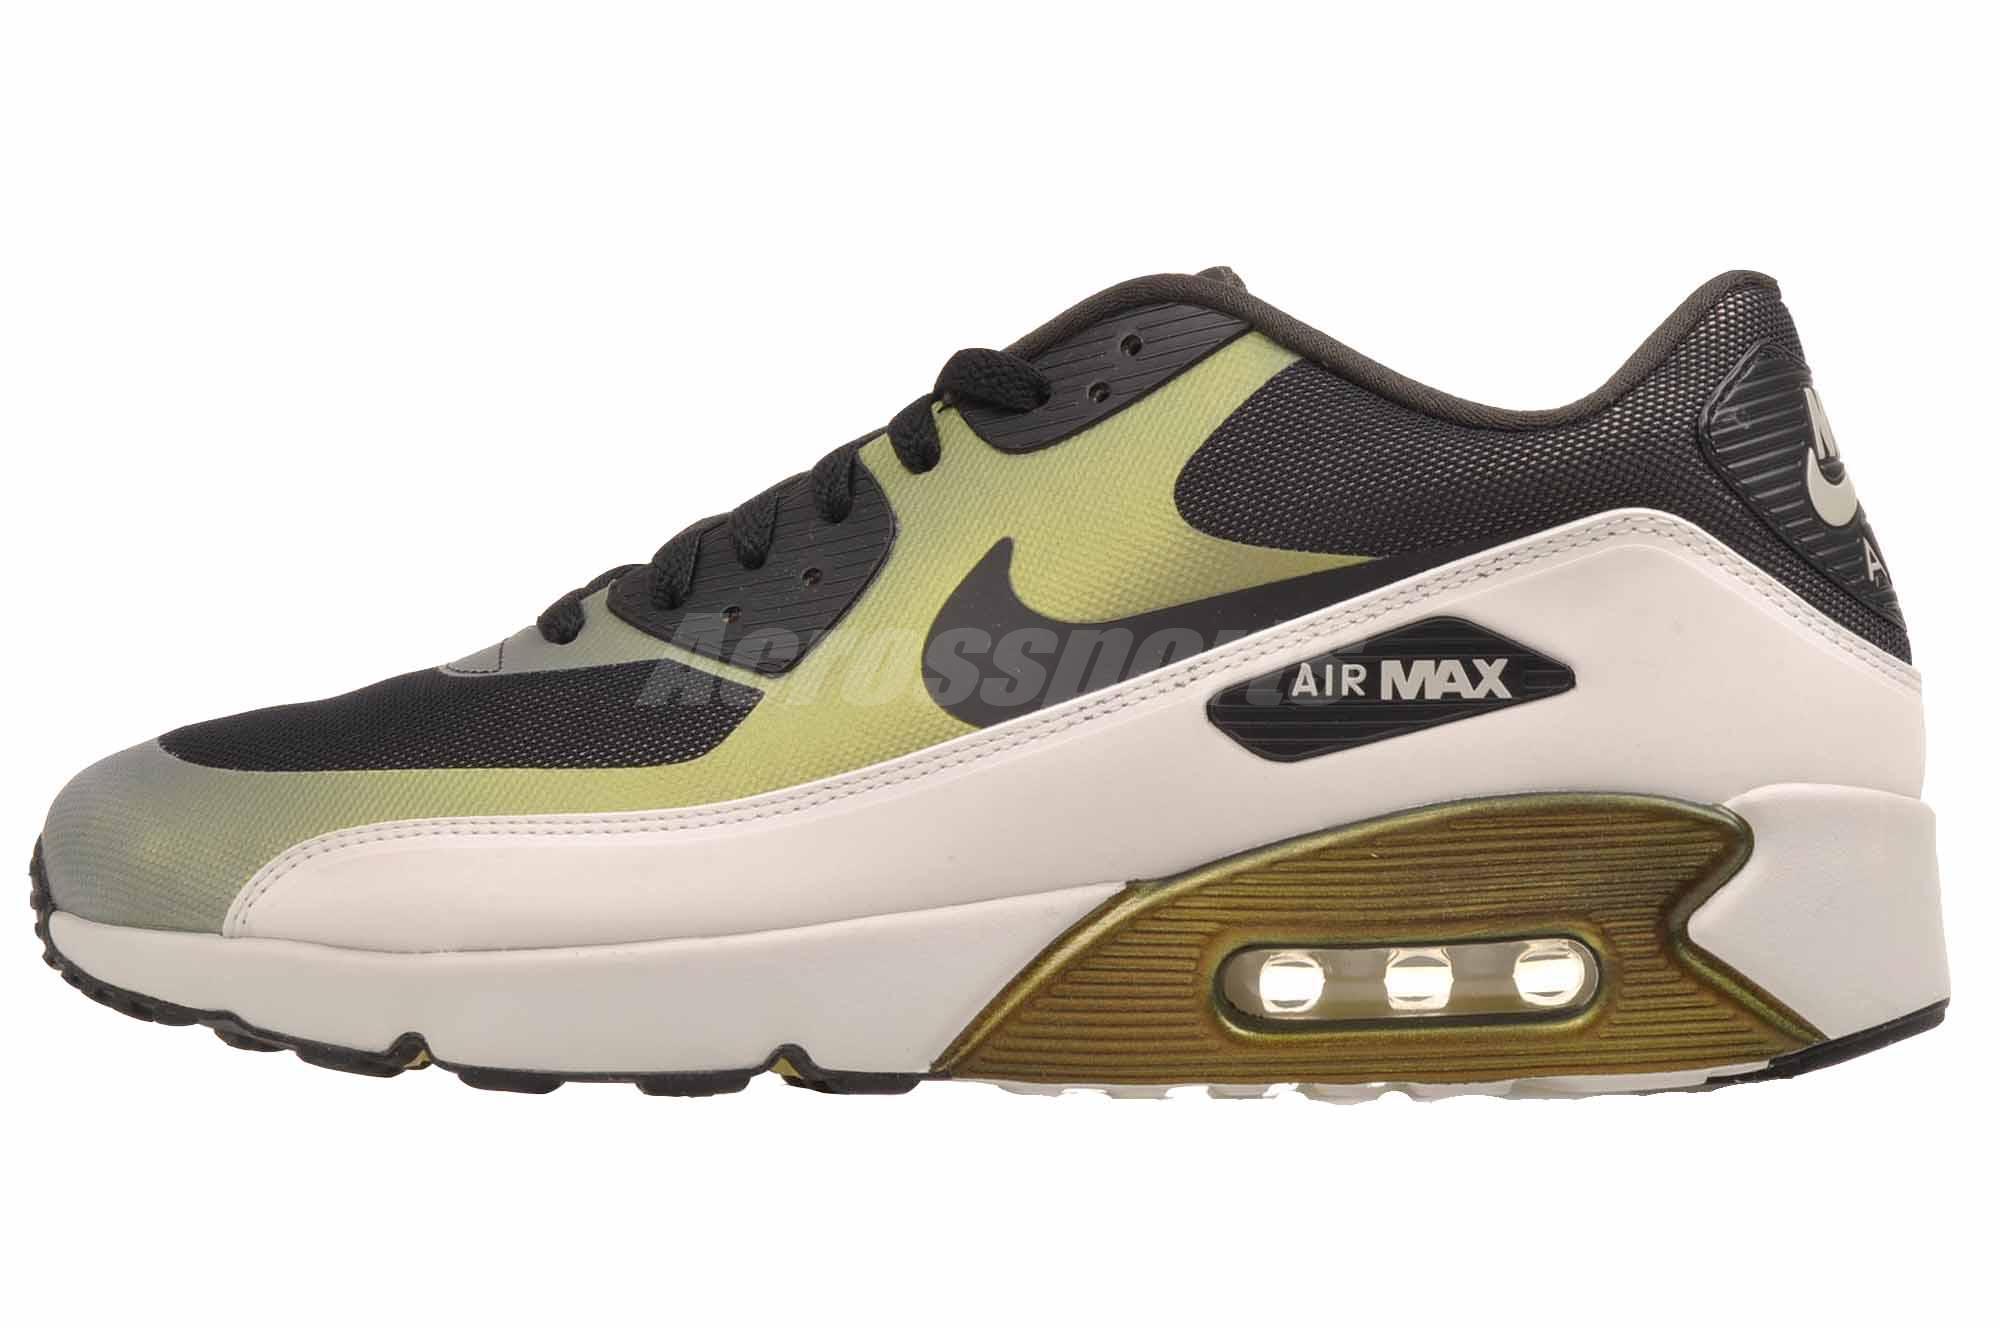 ... b93f41d857d0 Nike Air Max 90 Mens Size Guide - Musée des impressionnismes  Giverny ... 6b6ee5452d924